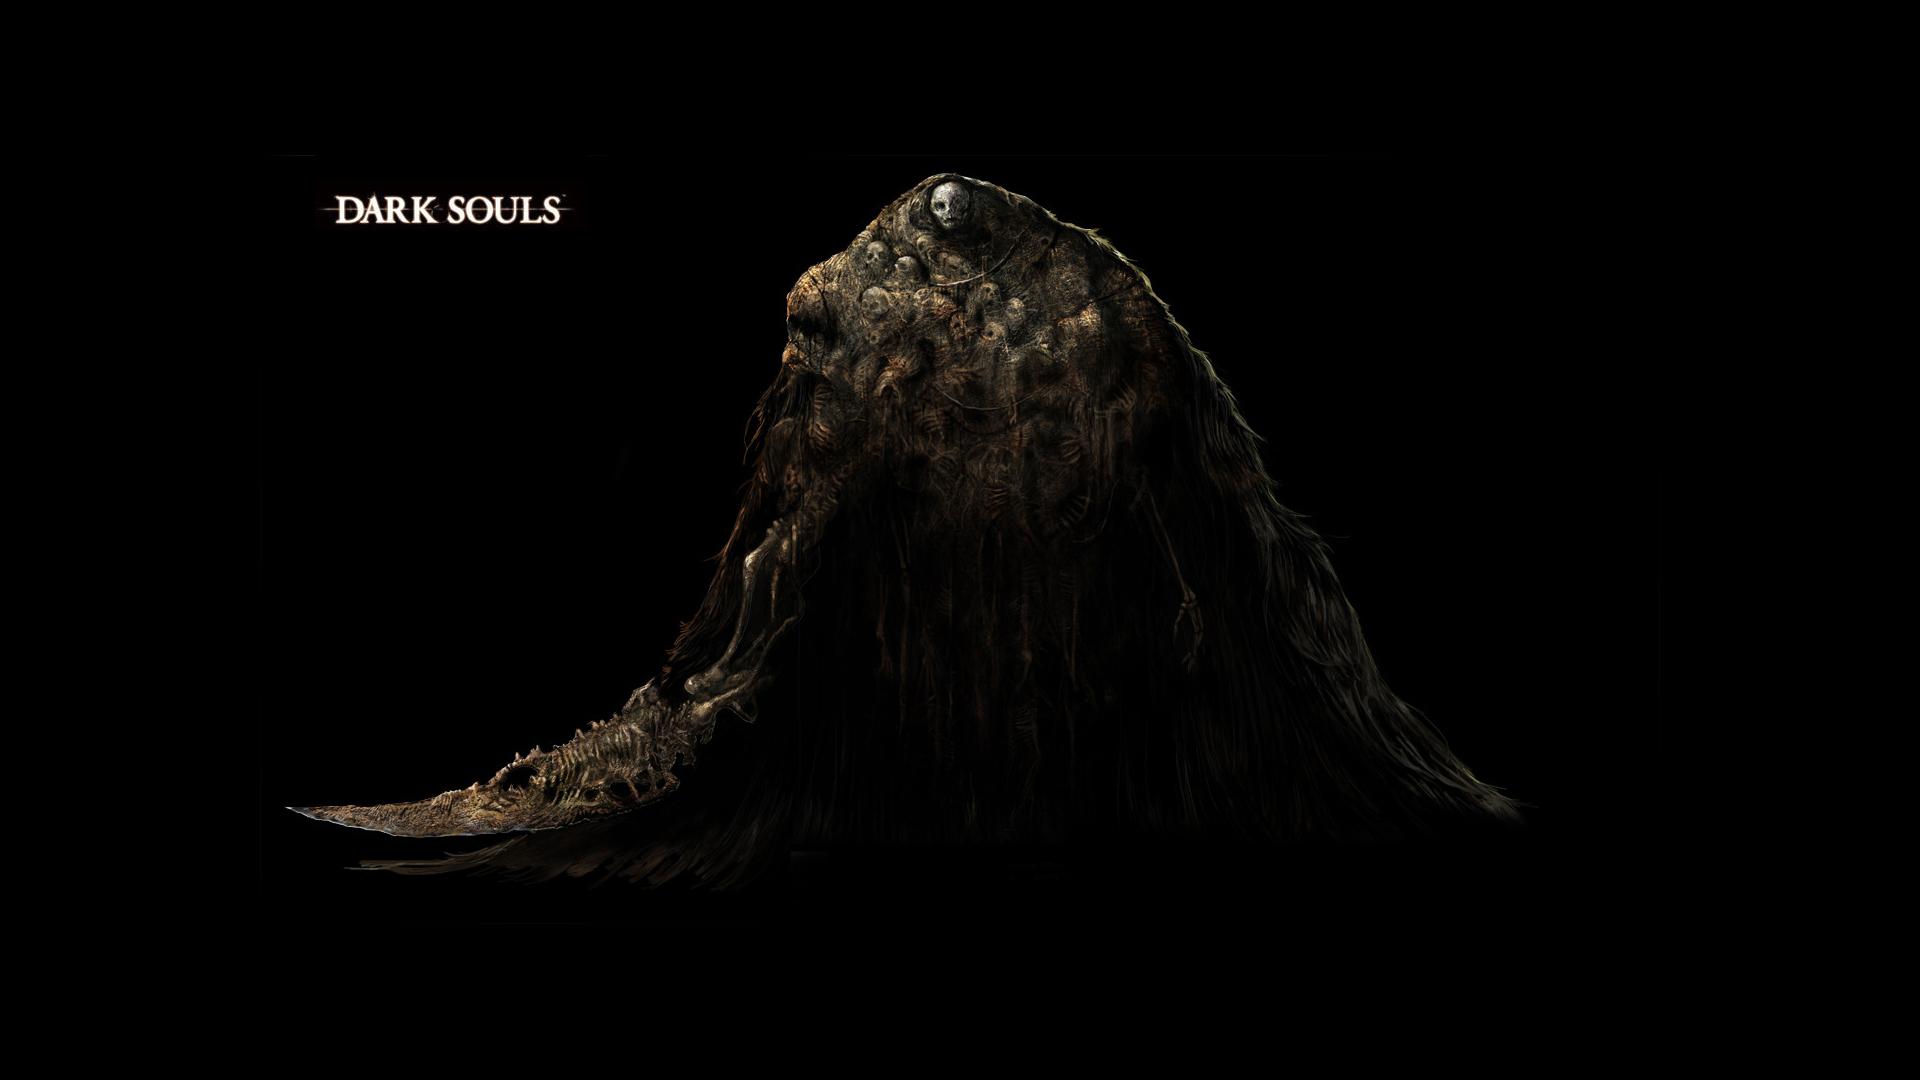 dark souls nito artwork - photo #17